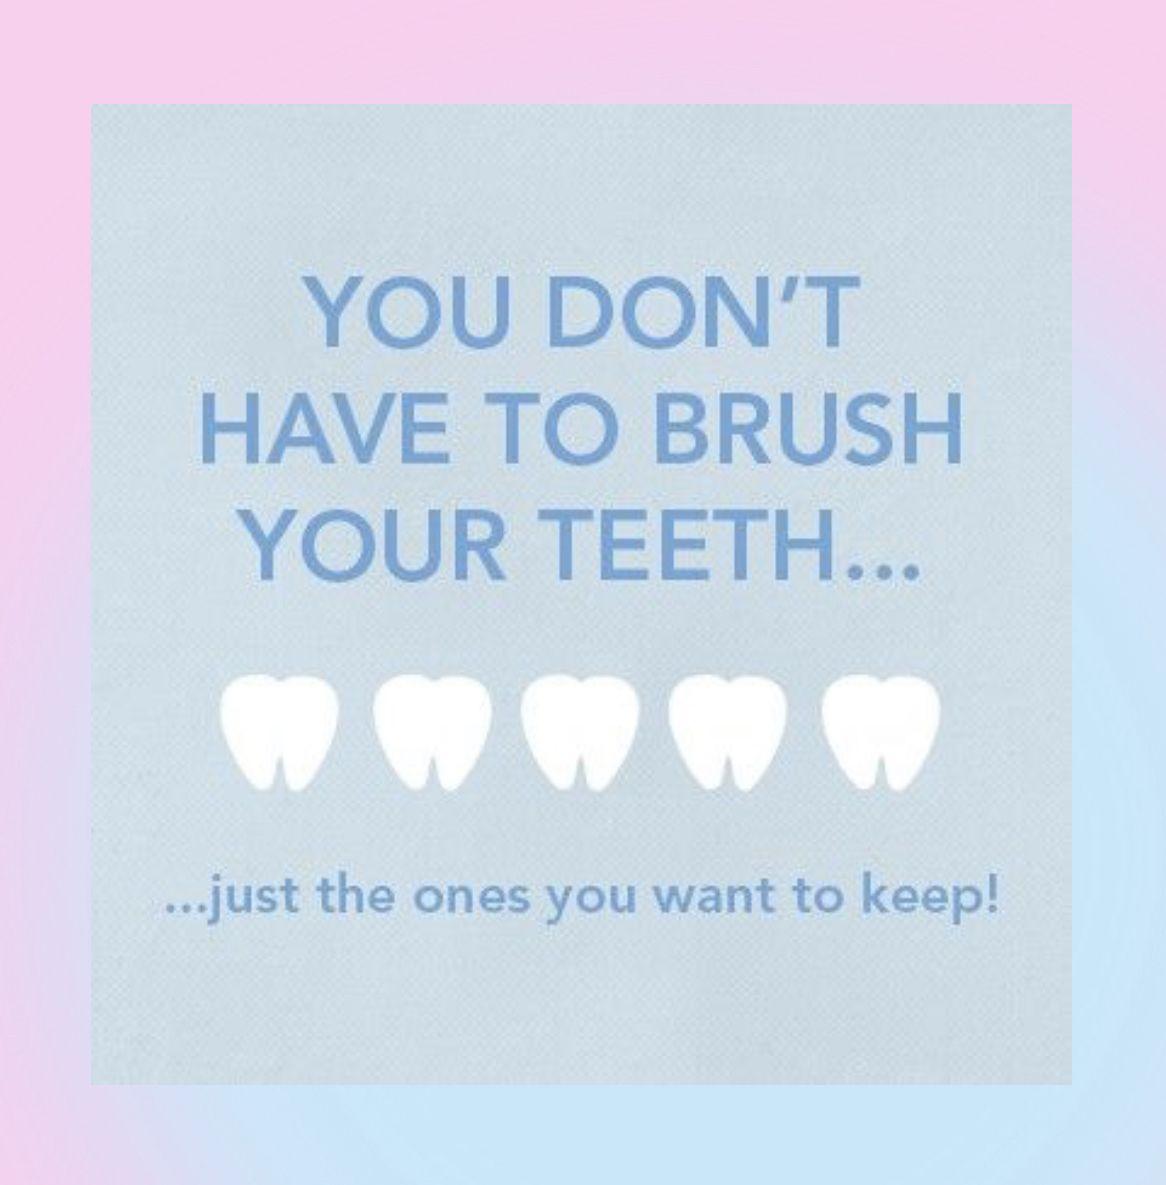 A good reminder for your kids while they brush their teeth!                       #MyToothyTots #childrensbooks #toothfairy #healthyteeth #healthygums #oralhygiene #kids #teaching #teeth #learning #dentist #brushyourteeth #lostatooth #toothholder #toothfairytime #toothfairyiscomingtonight #oralhealth #tooth #cleanteeth #healthysmile #happyteeth #nationaldentalassociation